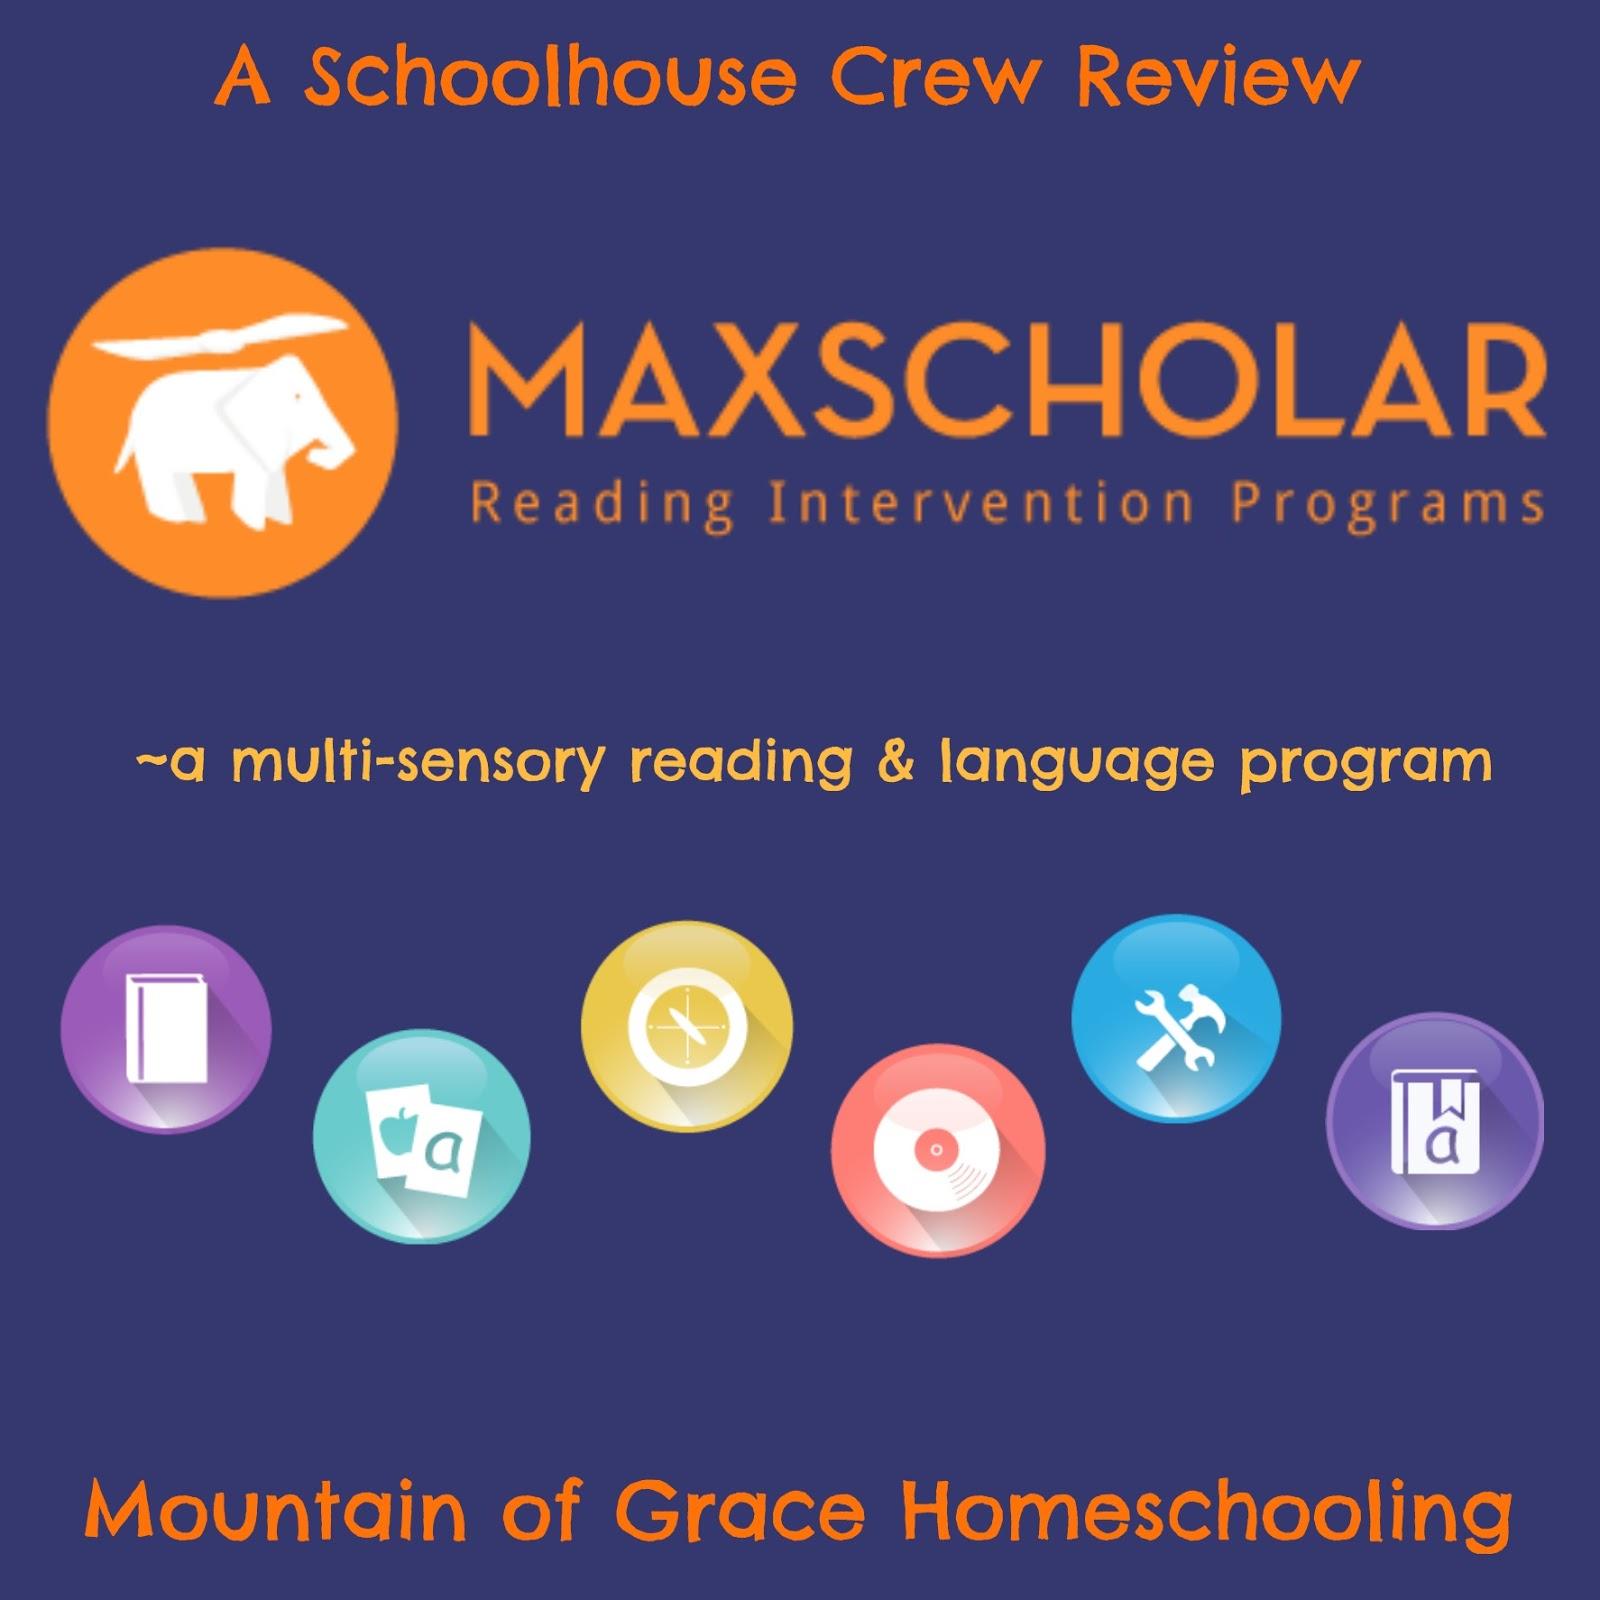 Do language arts intervention programs increase